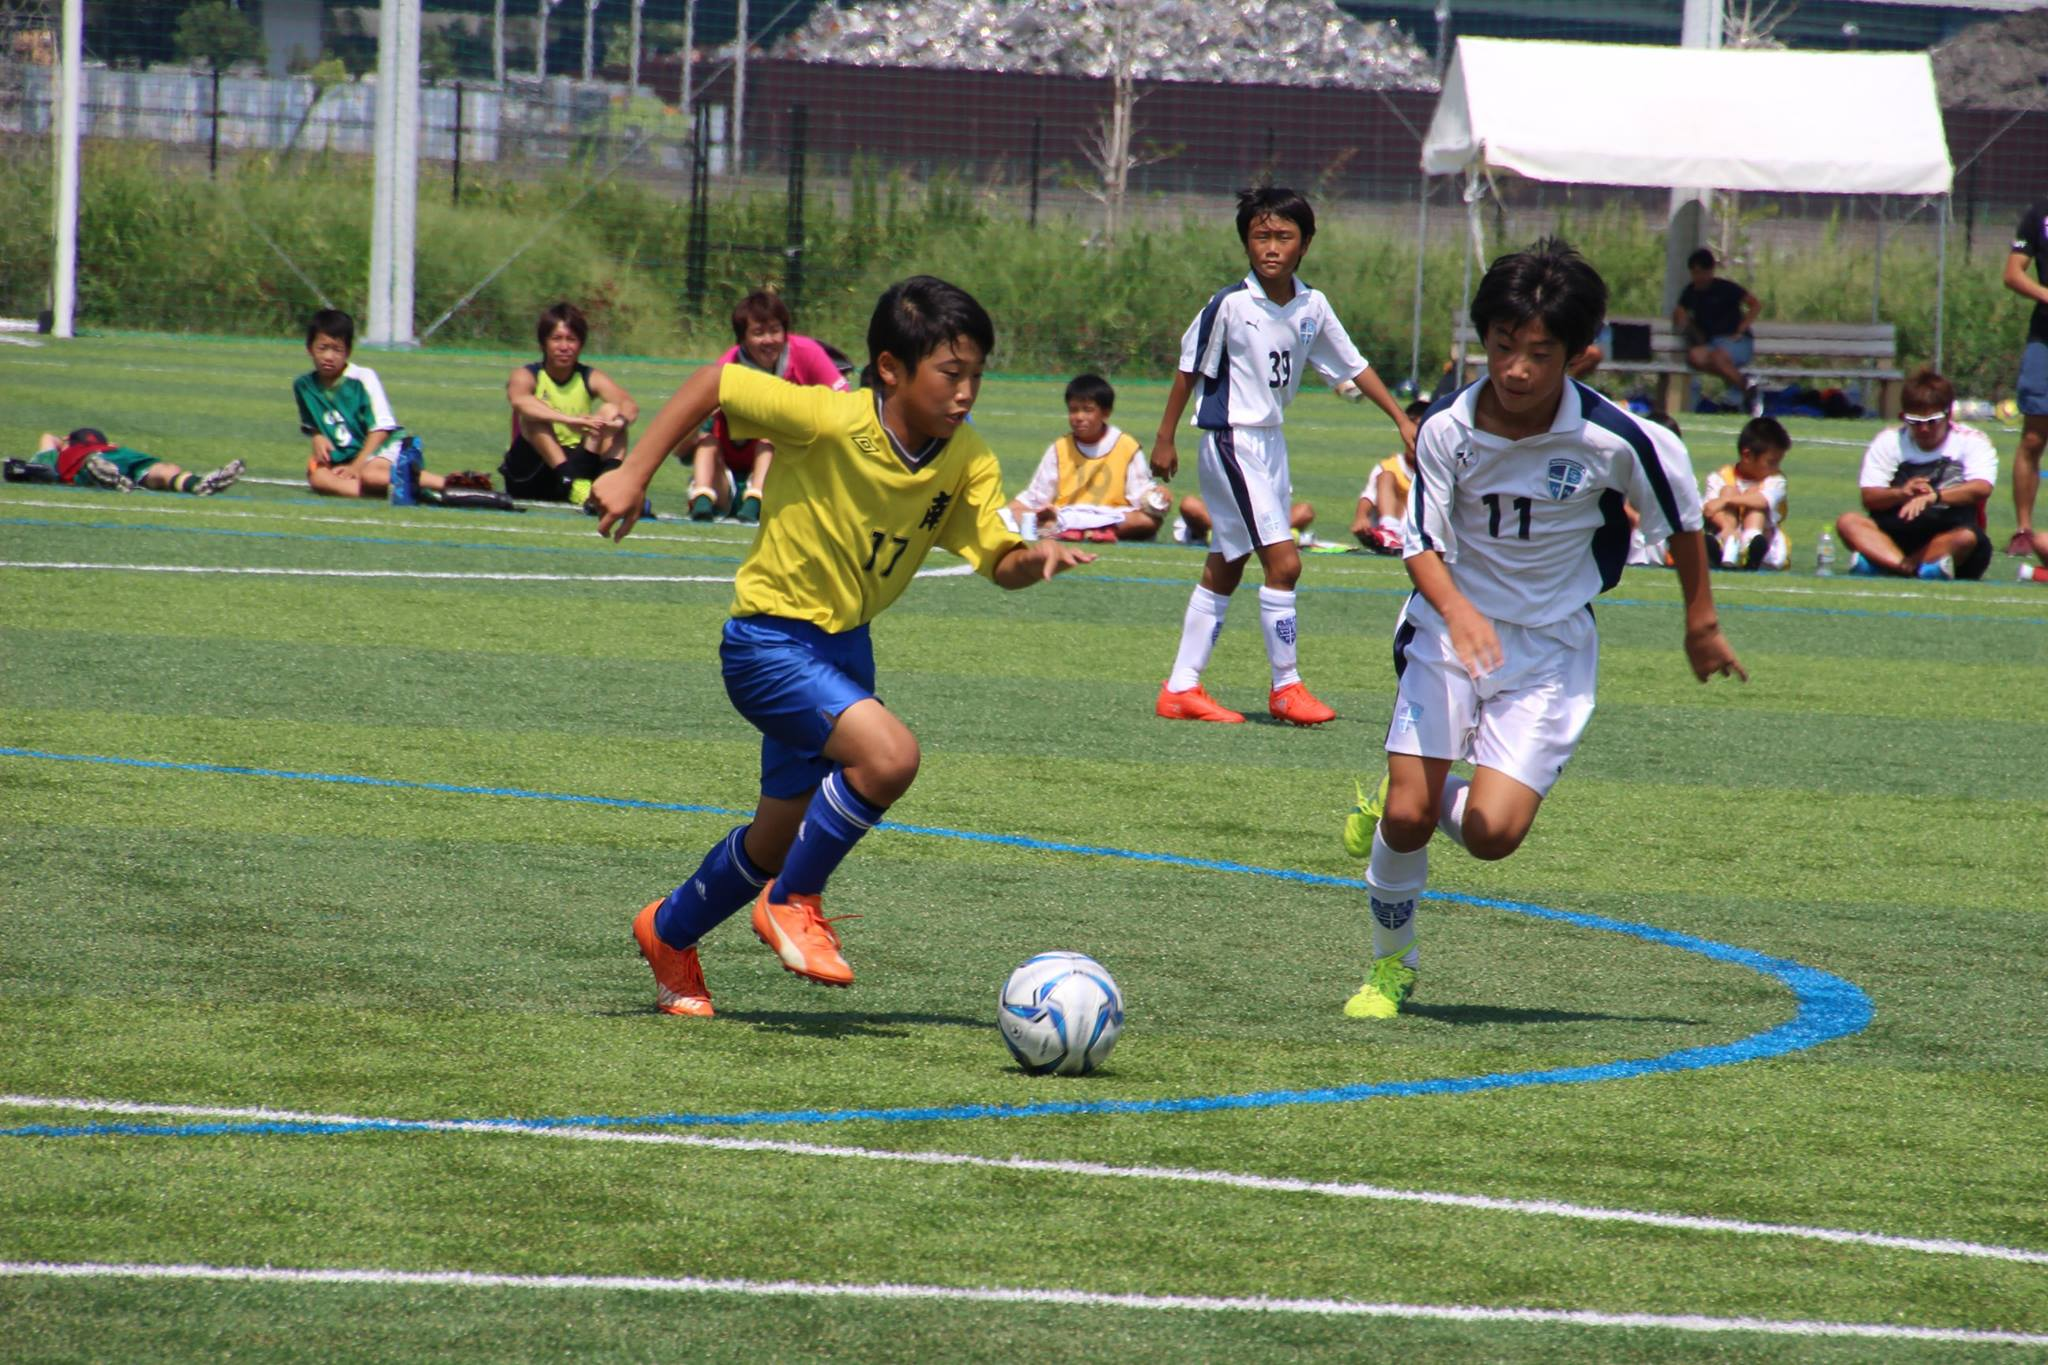 JCカップU-11少年少女サッカー大...